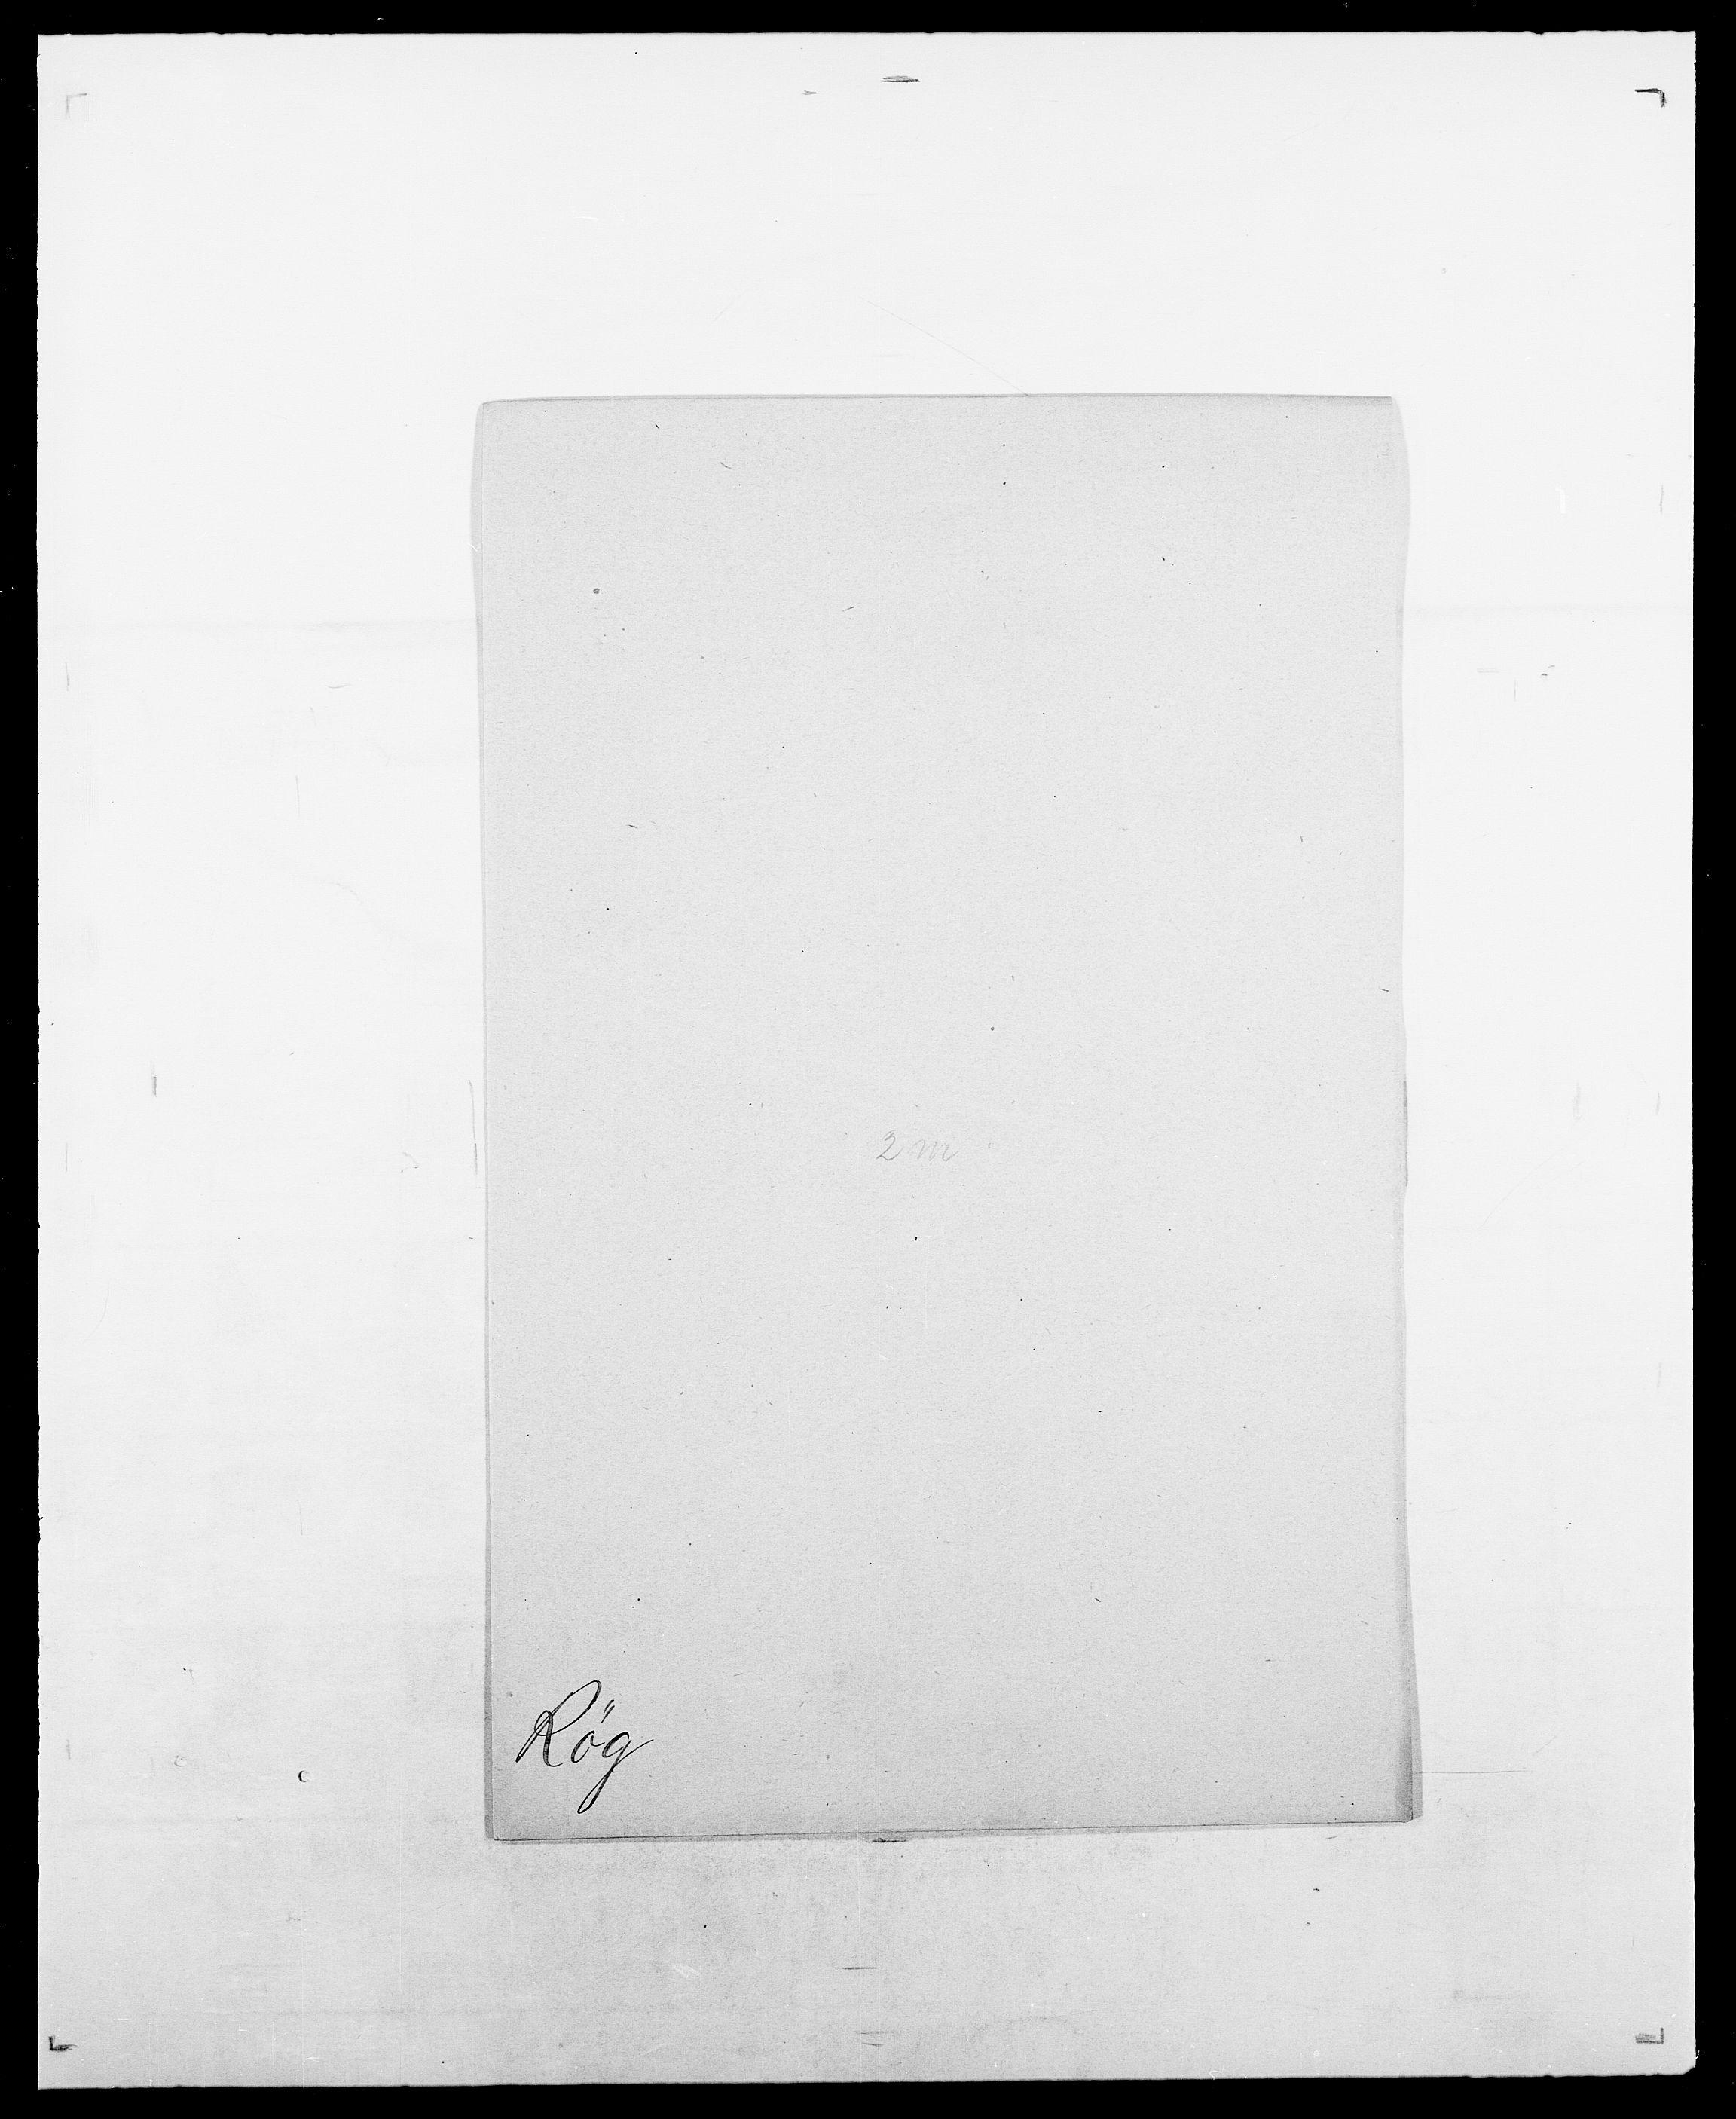 SAO, Delgobe, Charles Antoine - samling, D/Da/L0033: Roald - Røyem, s. 695